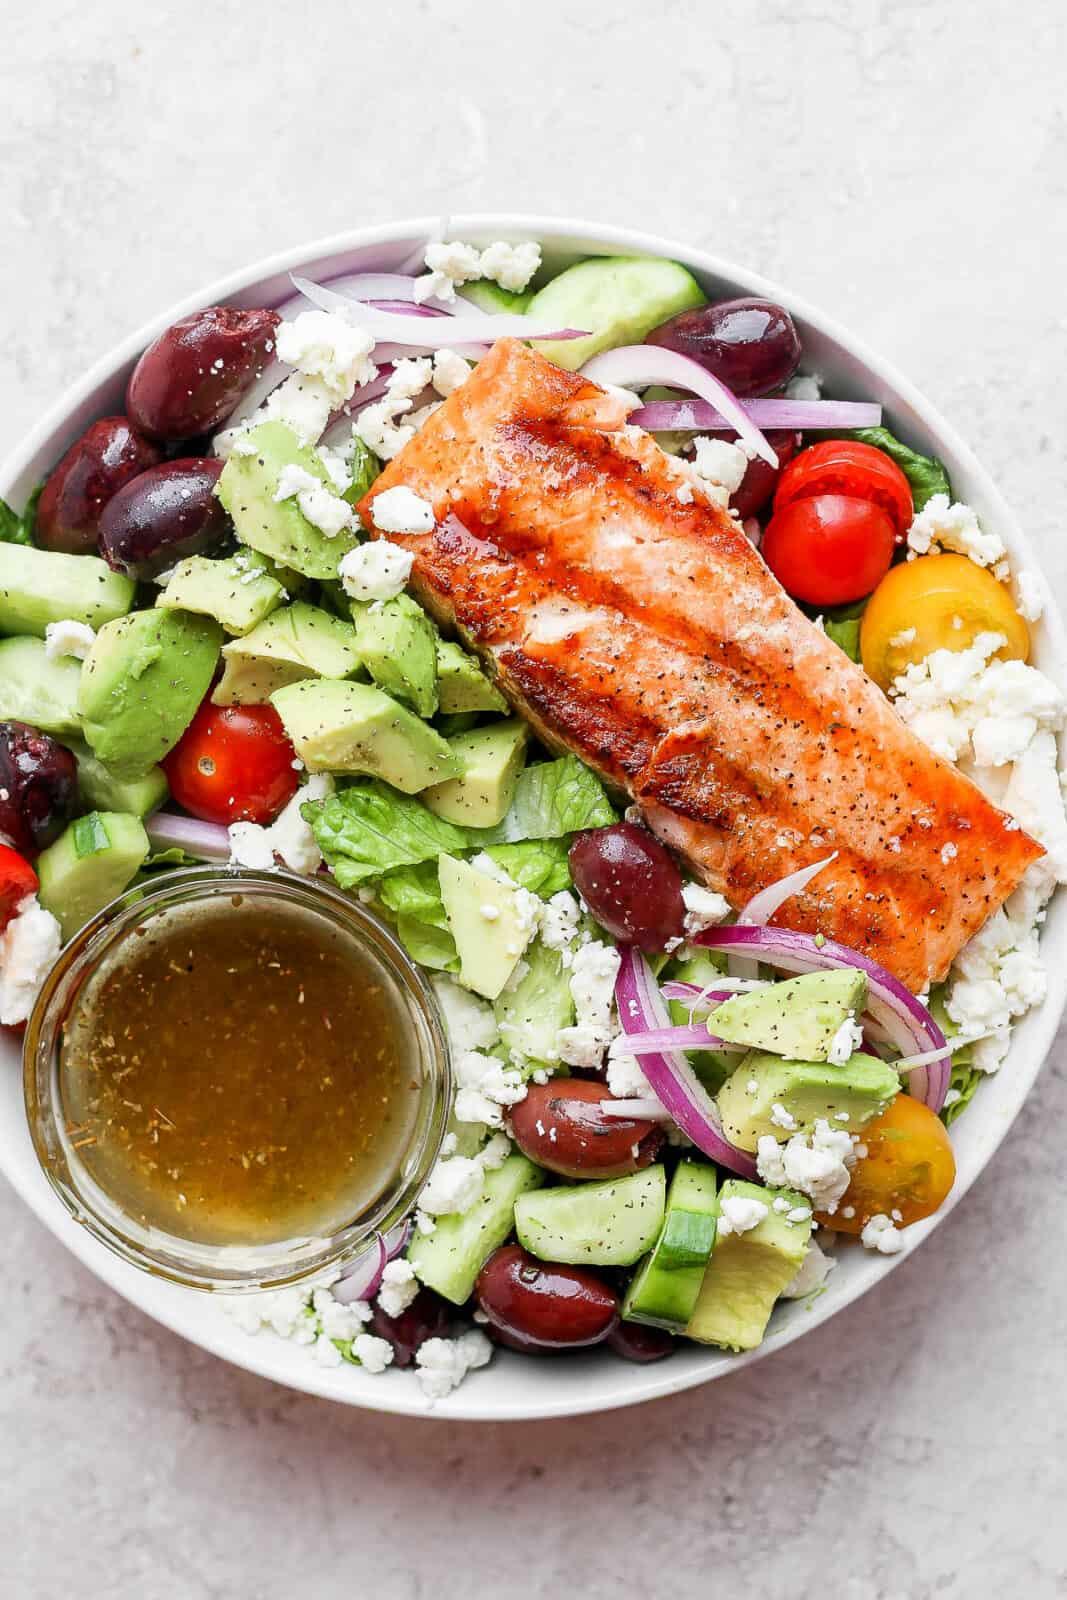 A small dish of greek vinaigrette in a salmon salad.